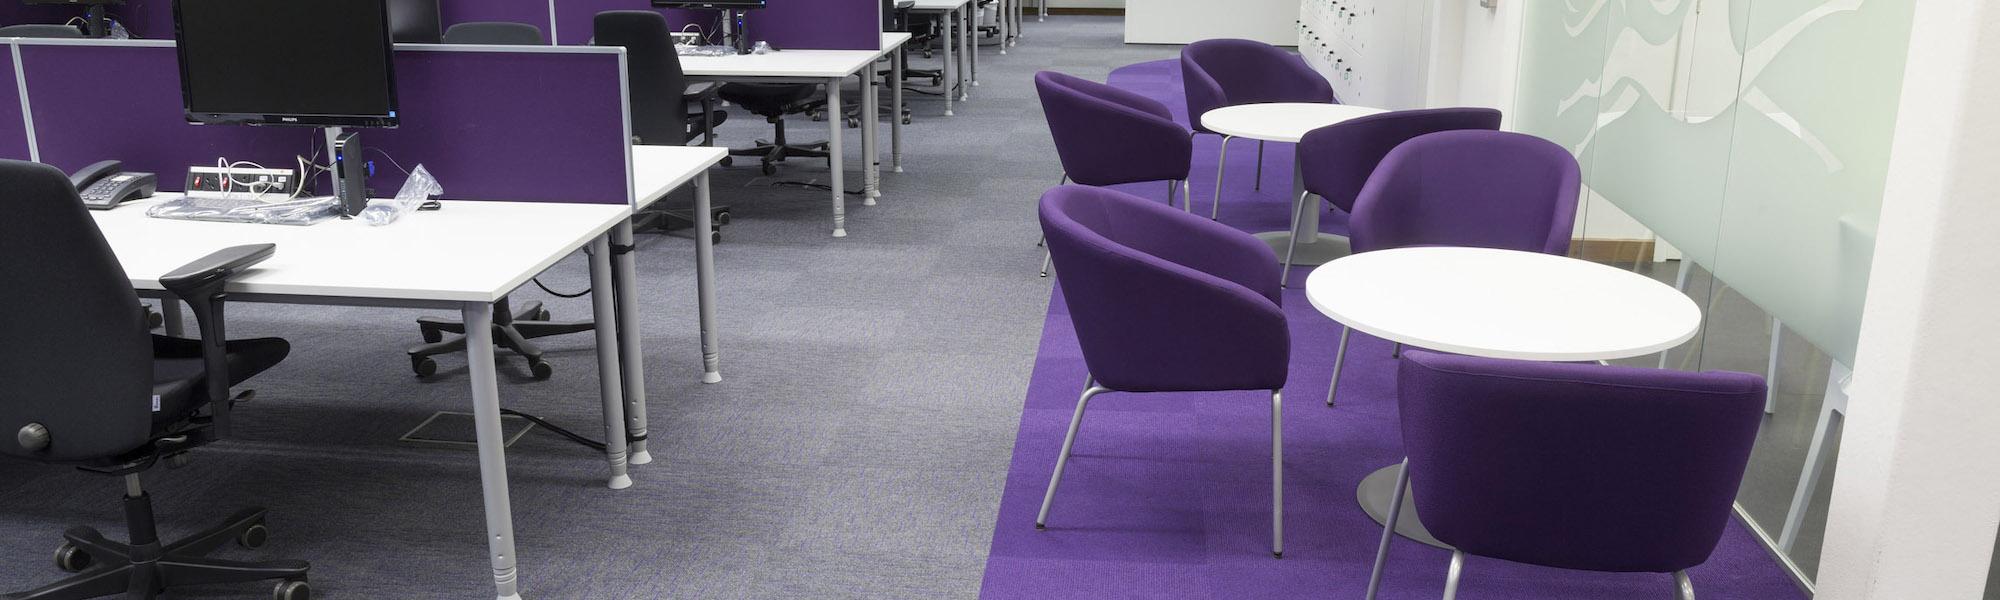 Heckmondwike FB | Commercial Carpet | Array and Broadrib